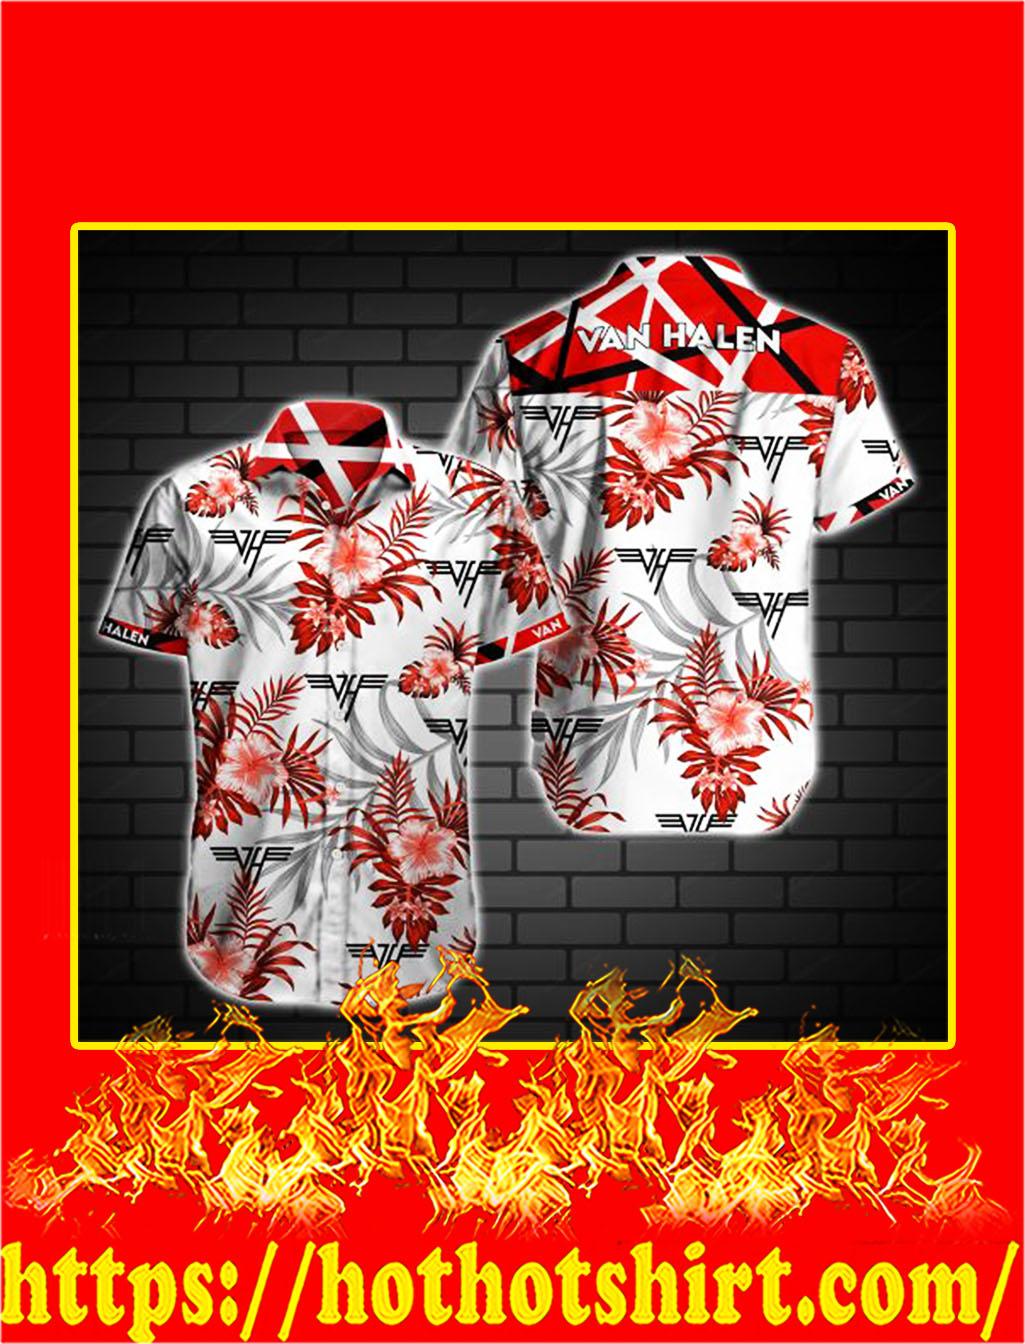 Van halen hawaiian shirt - L